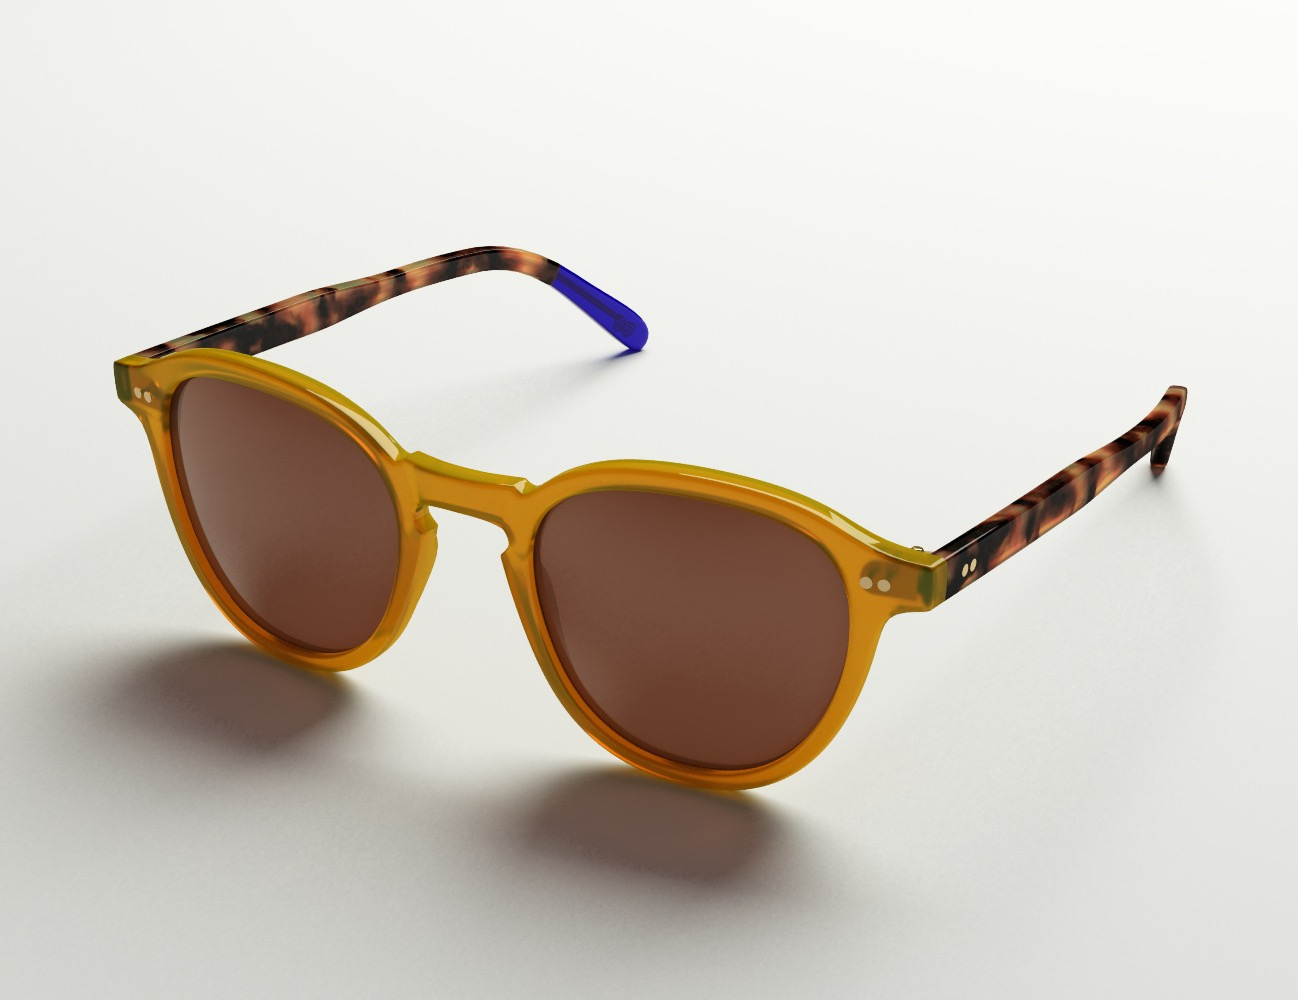 urban-owl-hd-sunglasses-03